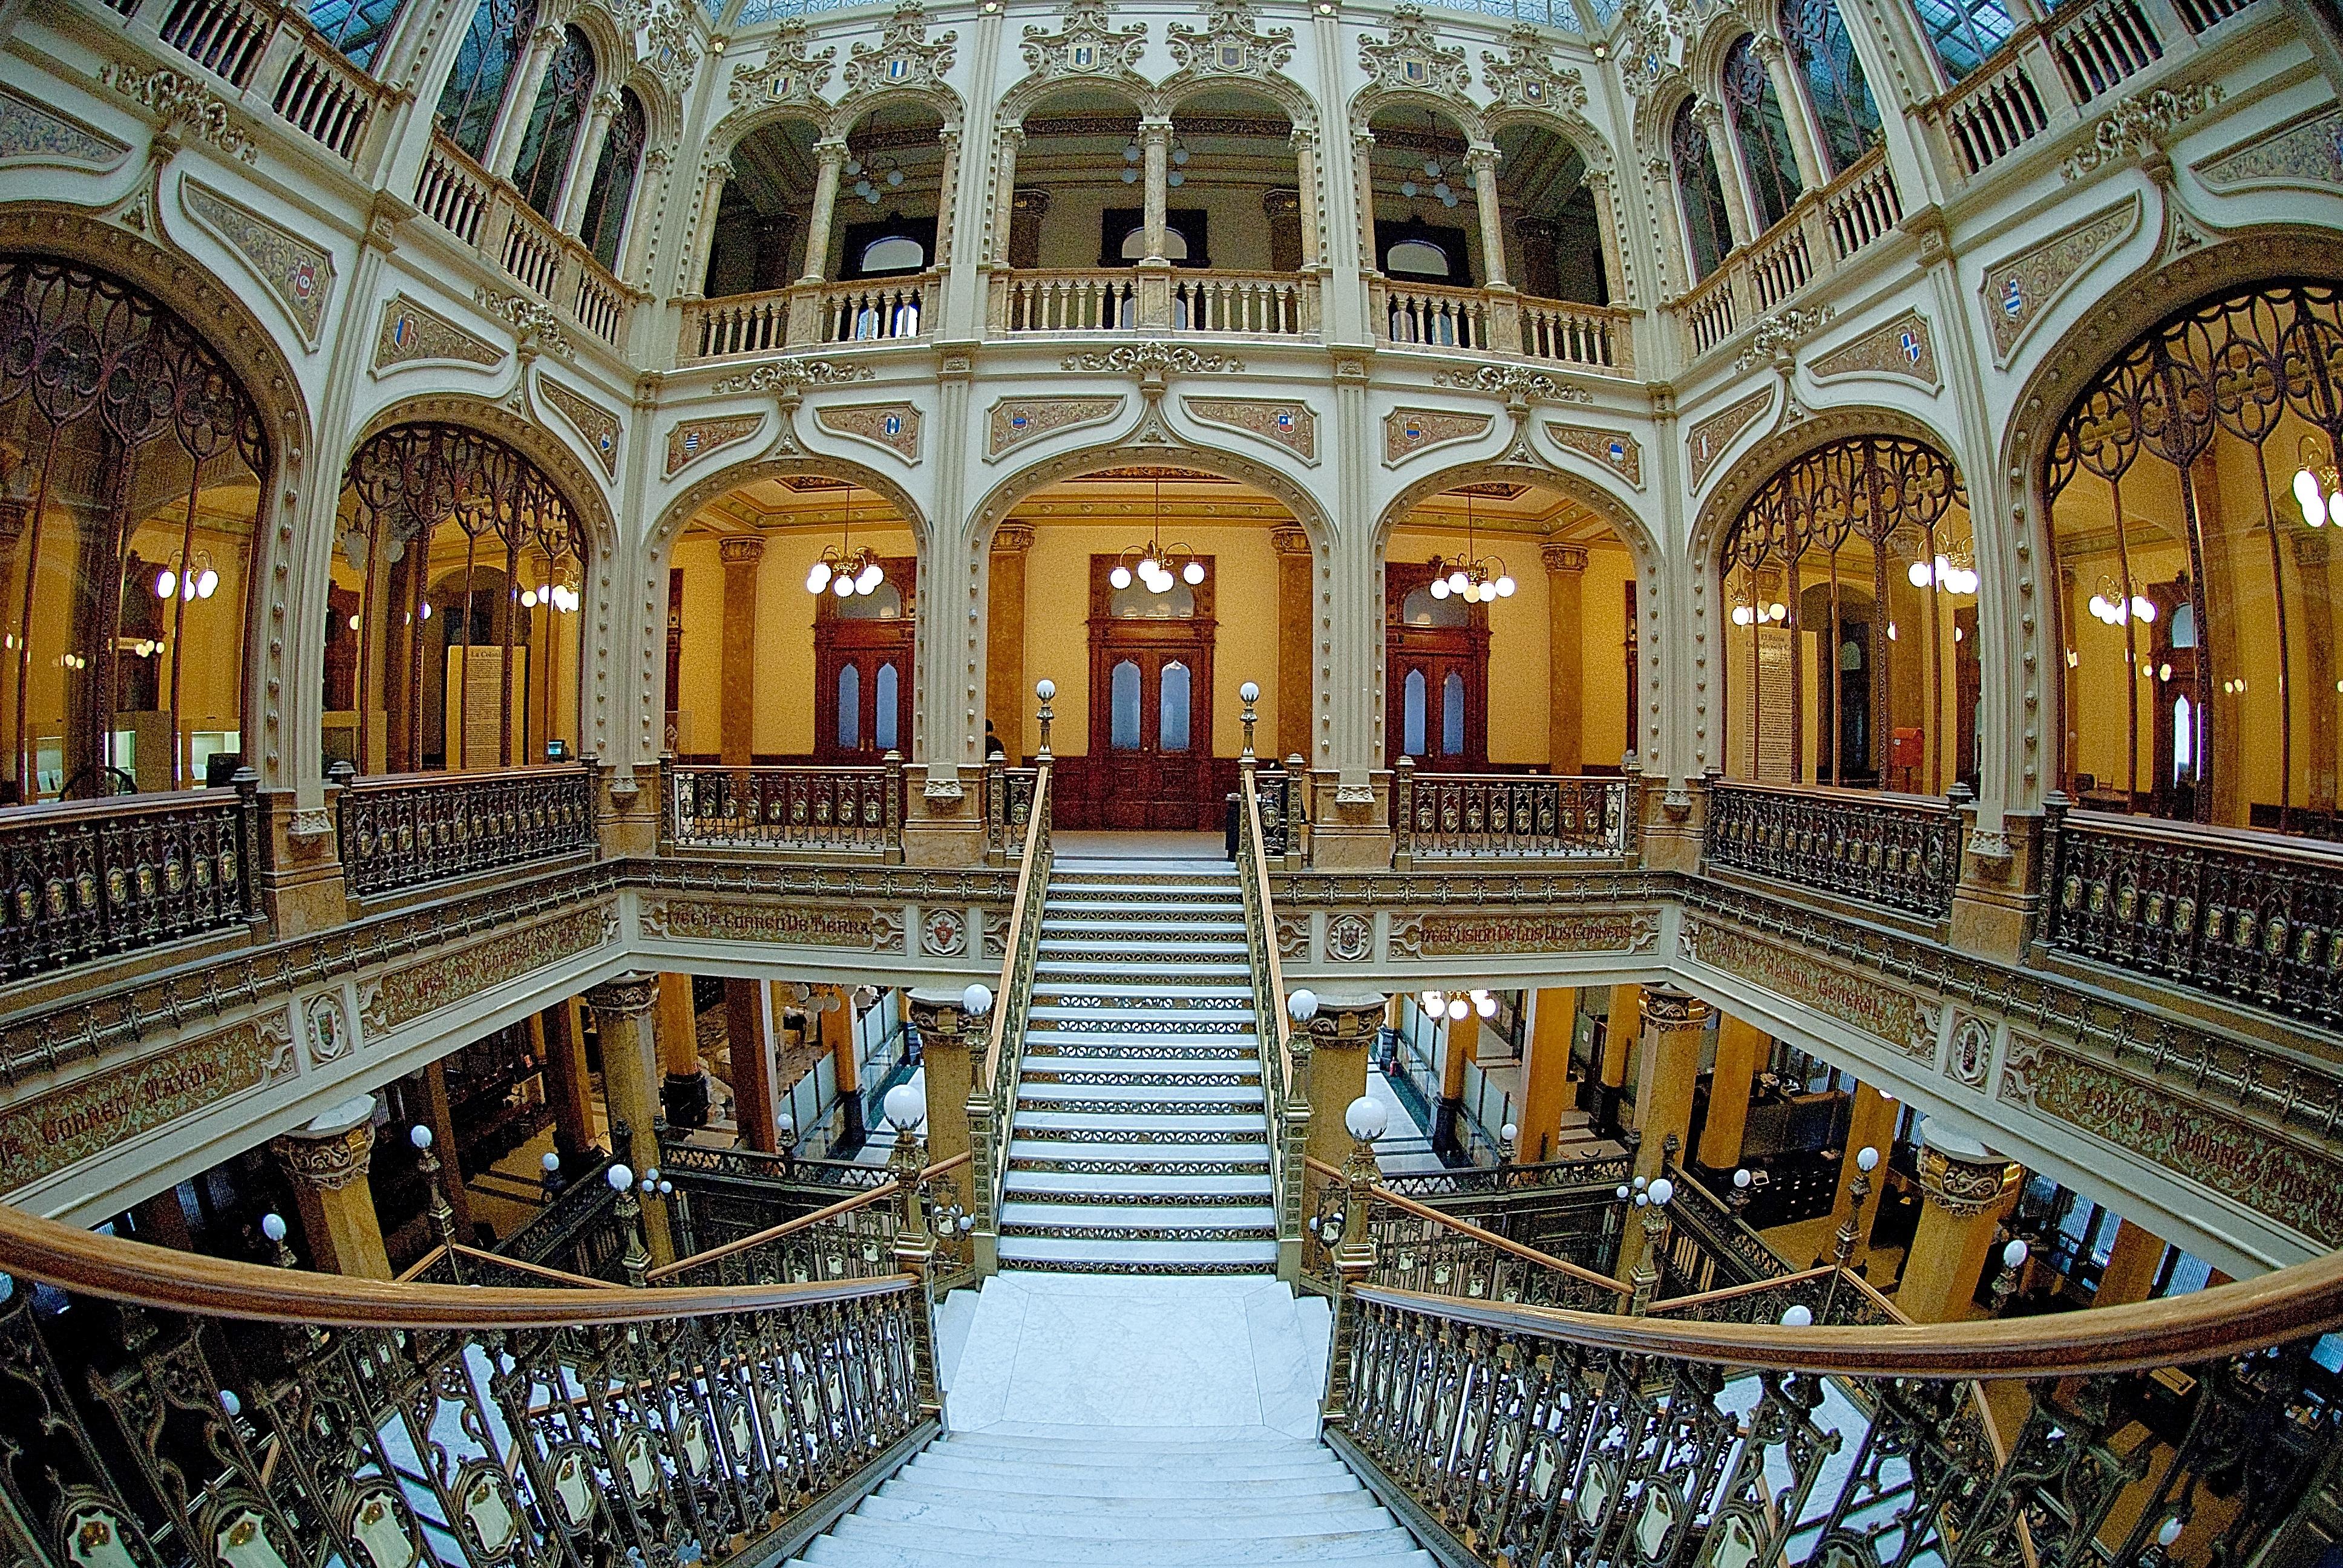 Fotos gratis : enviar, piso, edificio, palacio, claraboya, interior ...